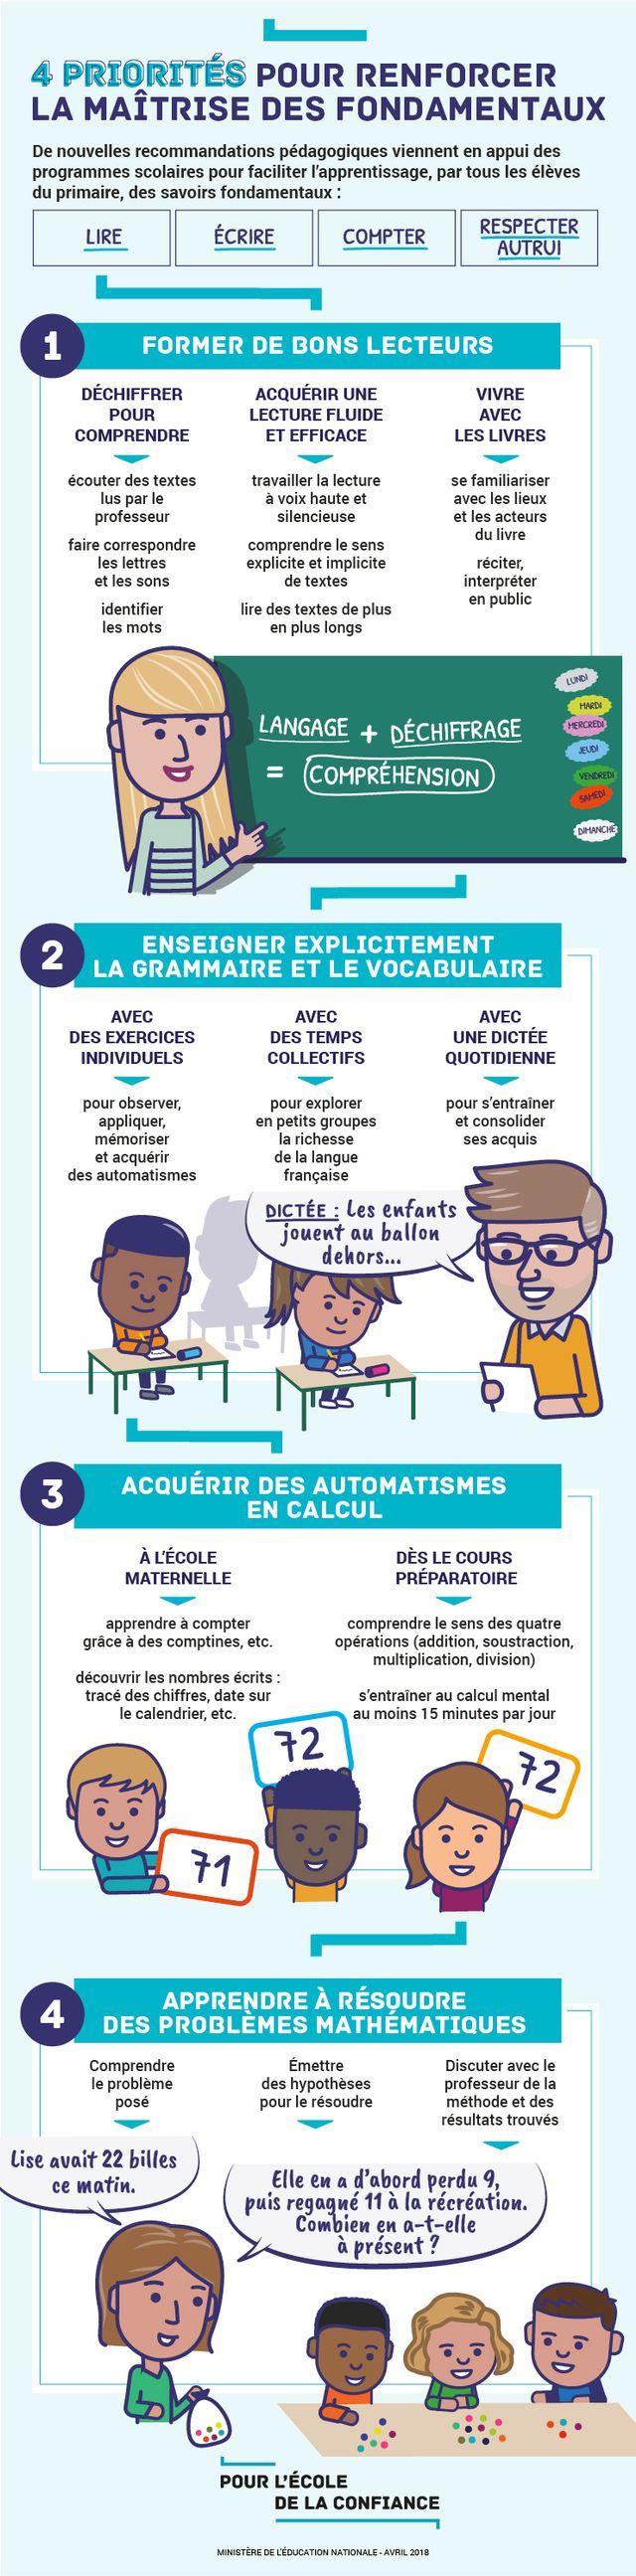 Les quatre priorités scolaires de Jean-Michel Blanquer.